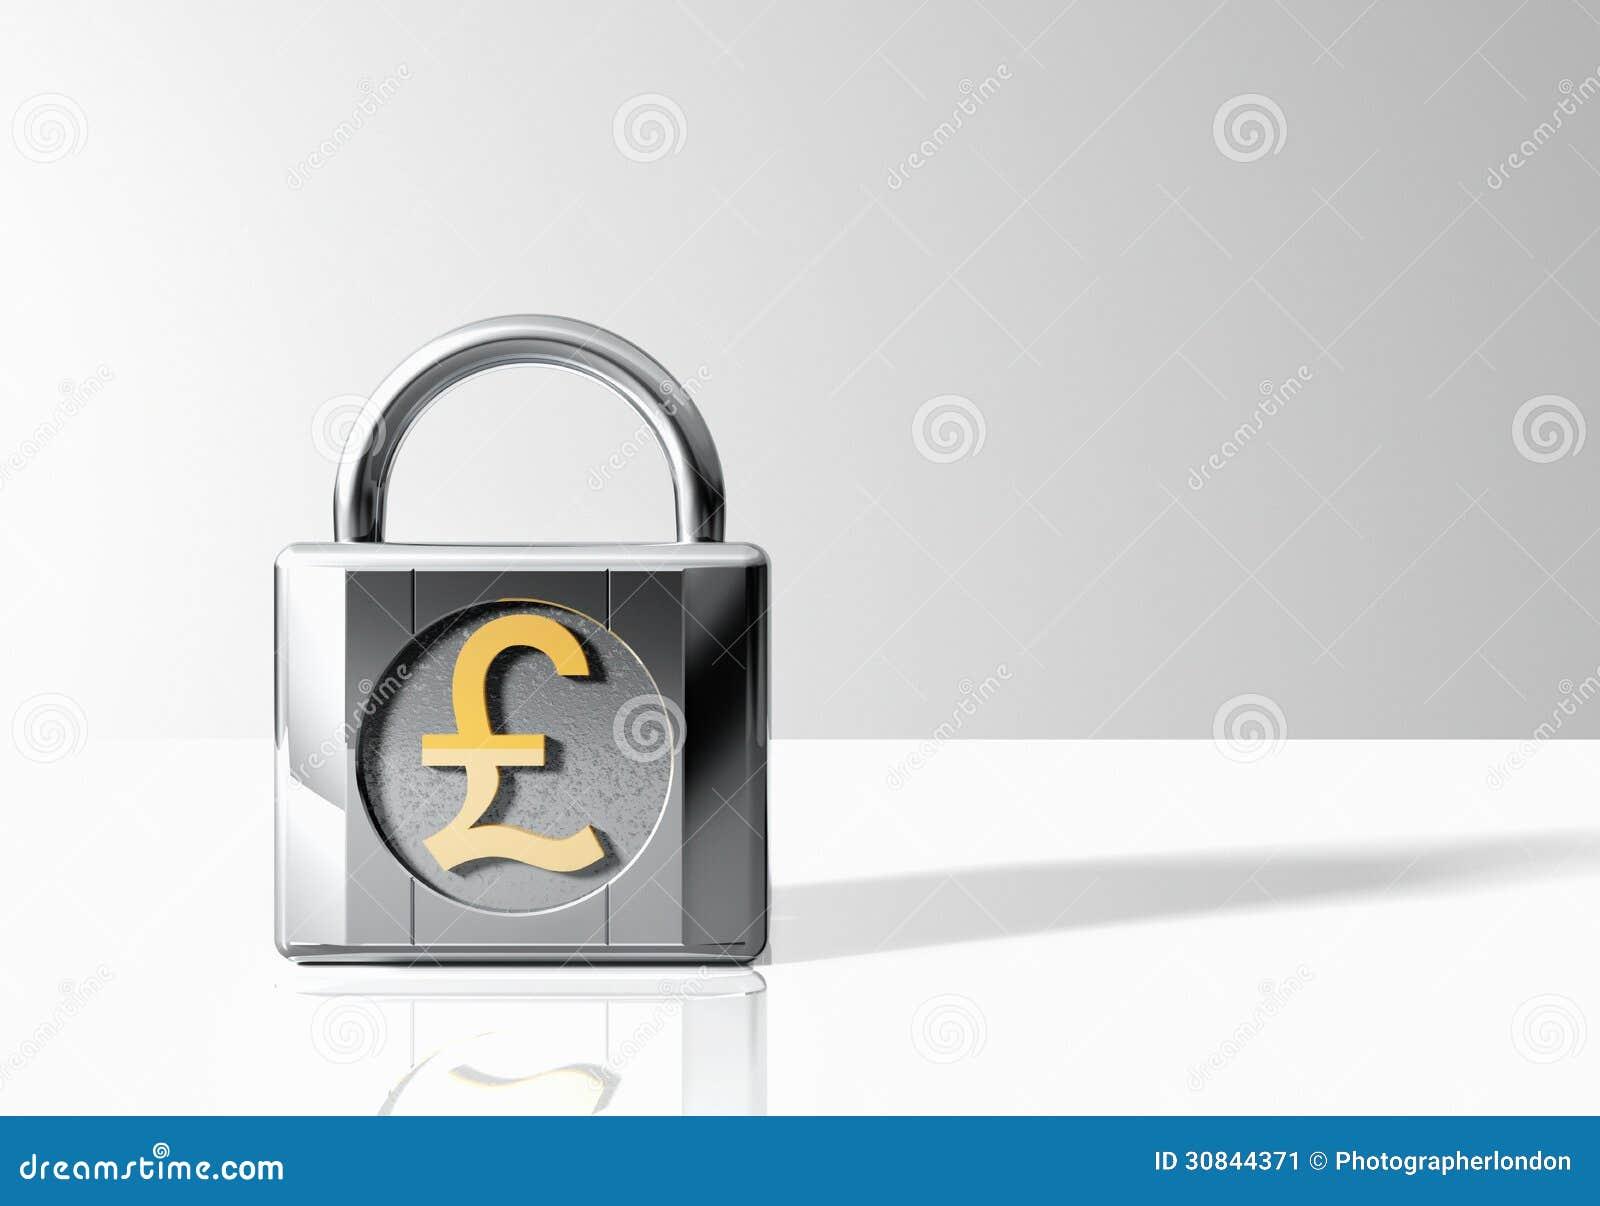 Padlock with british pound symbol stock image image of symbol padlock with british pound symbol biocorpaavc Choice Image